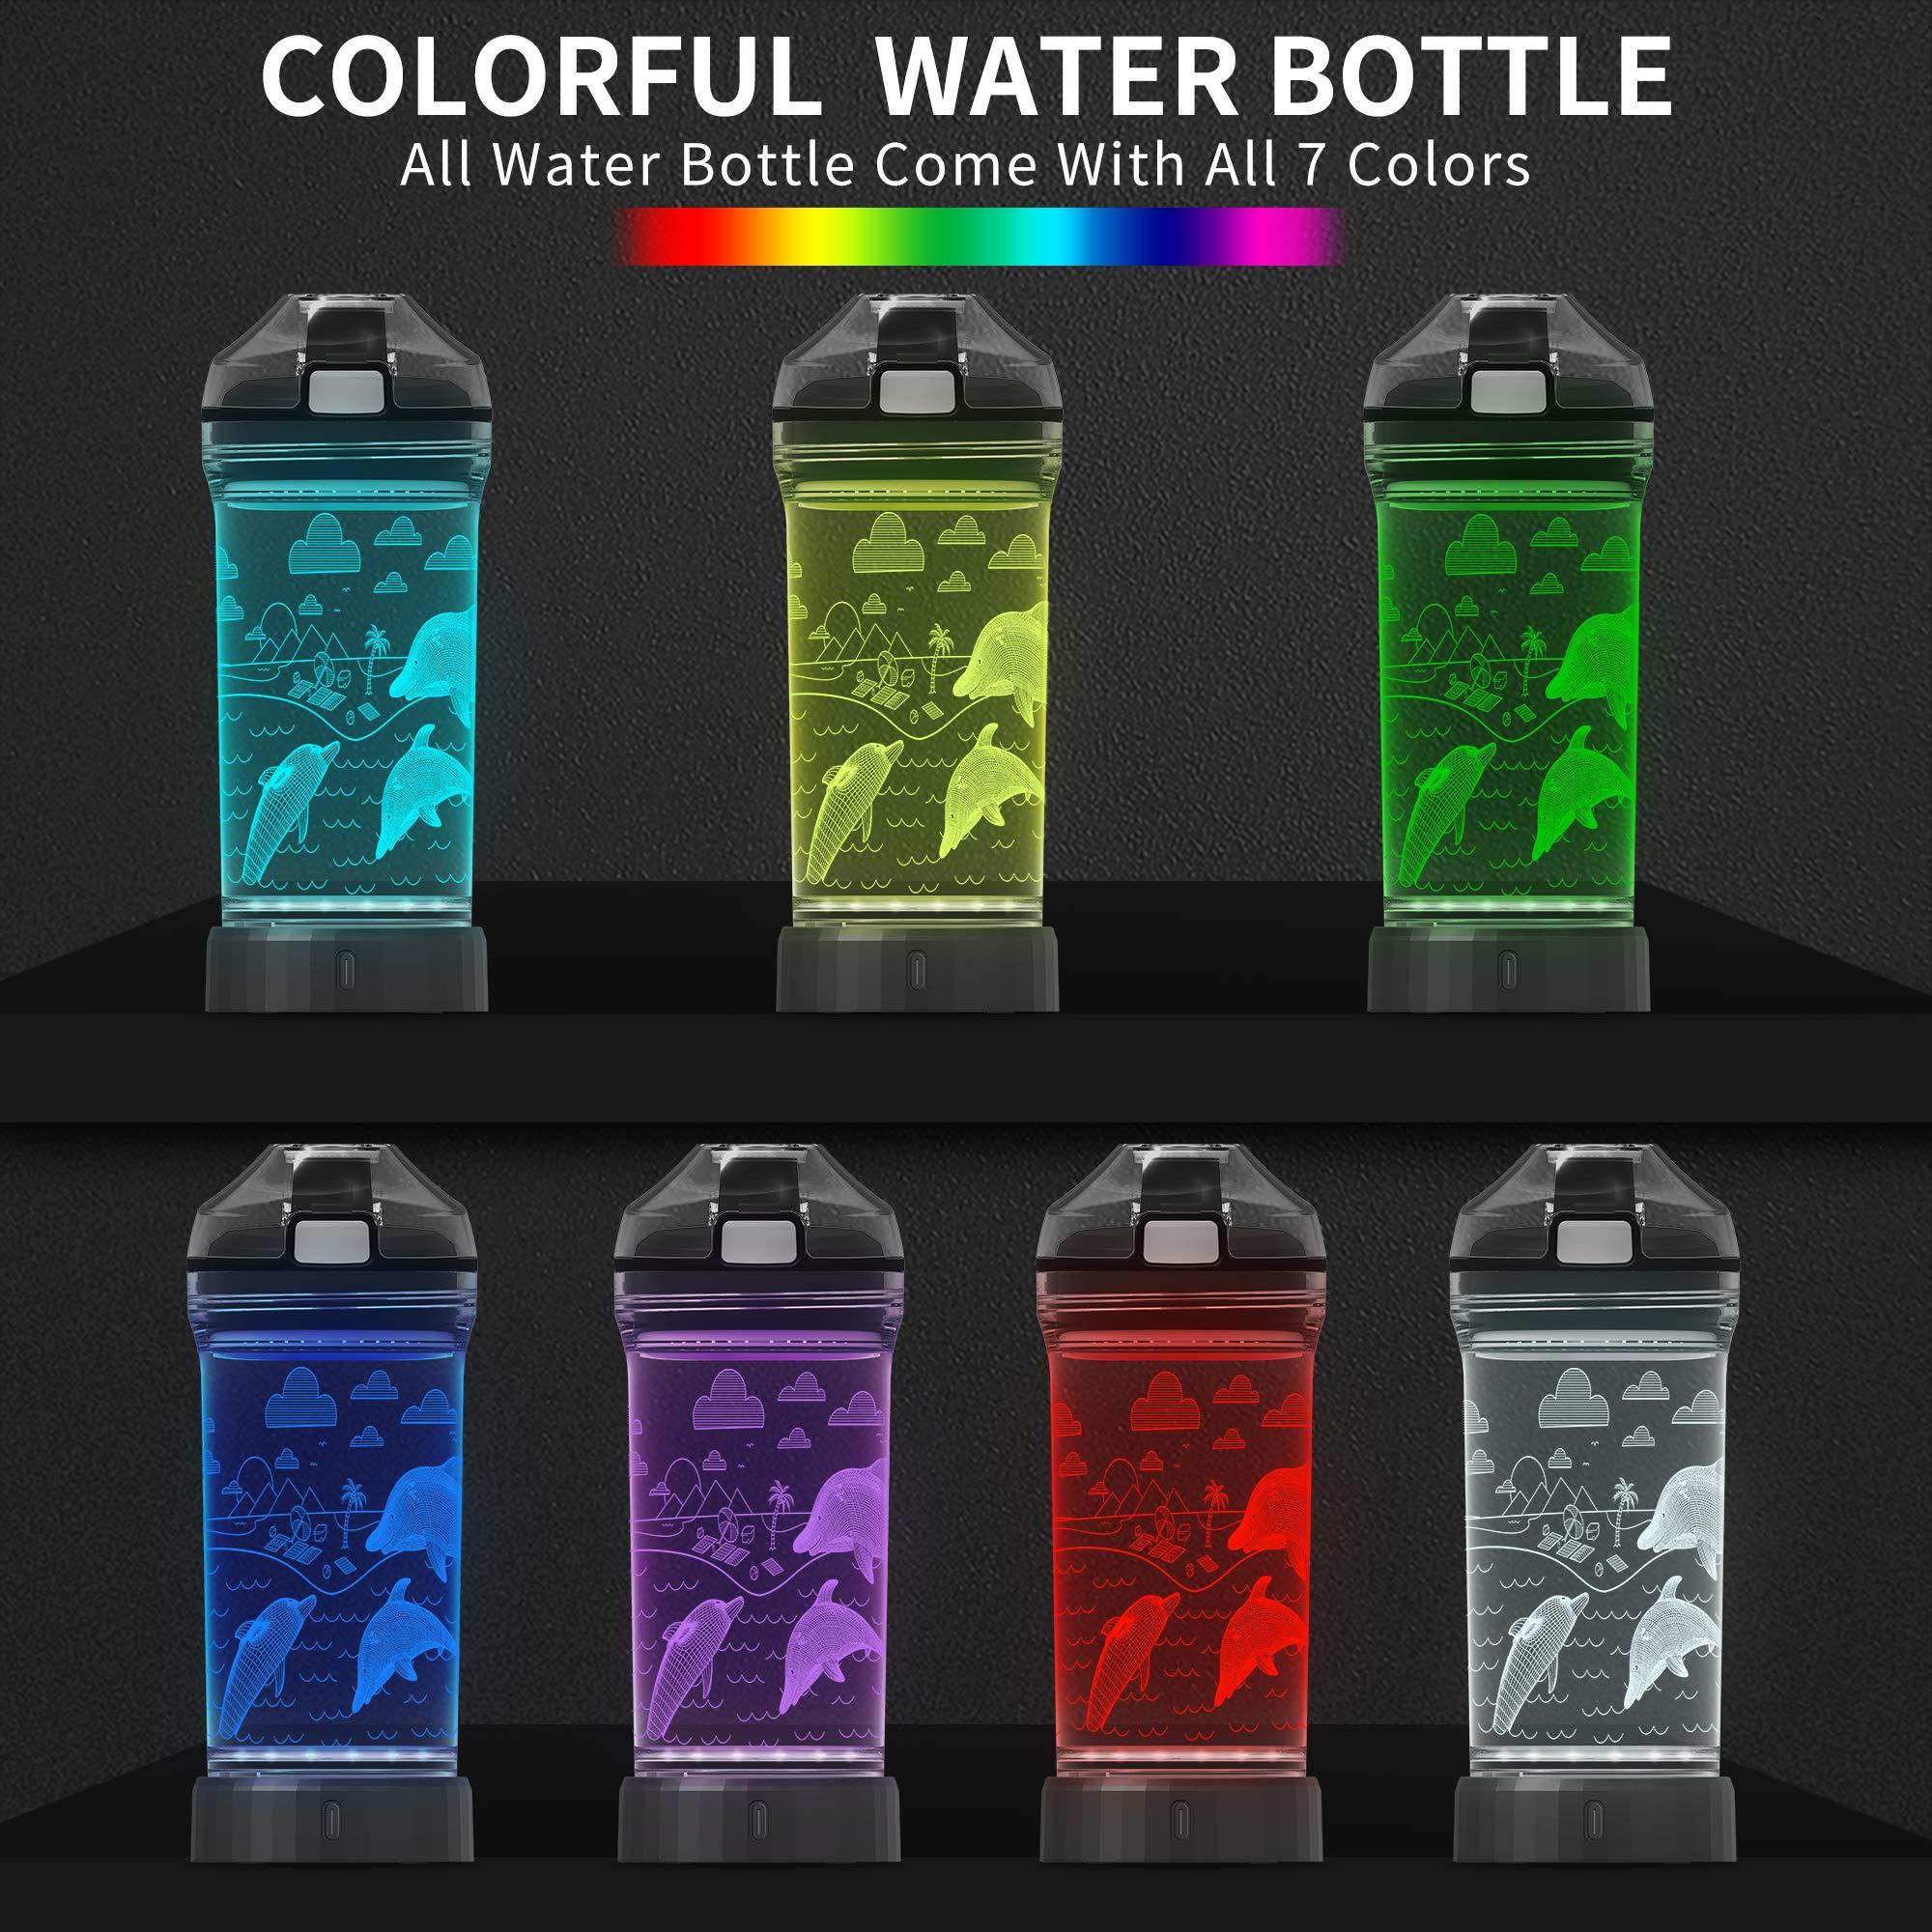 3D Dinosaur Illusion LED Light with 7 Color Changing Light 14 0z Lightzz Kids Watter Bottle Creative Idea Raptor Gift for Boy Child Holiday Xmas